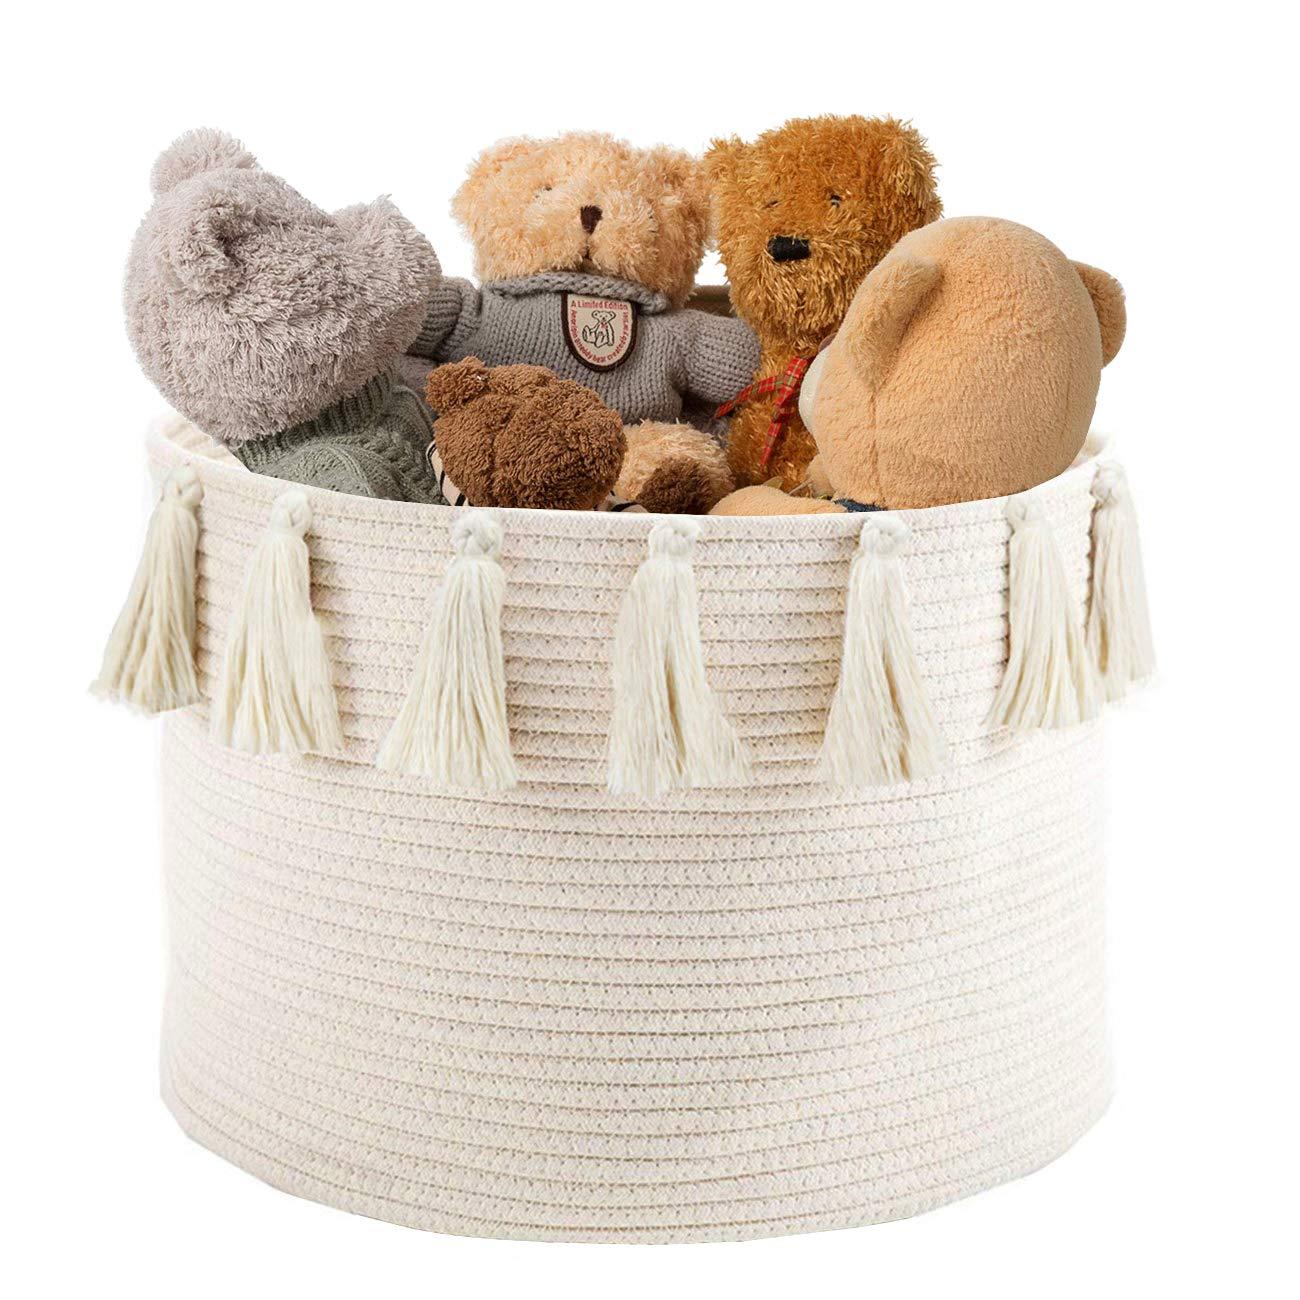 "Abetree Large Tassel Woven Basket Storage with Handle Cotton Laundry Hamper Nursery Basket Blanket Baby Toy Storage Organizer 17.7"" x 11.8"""